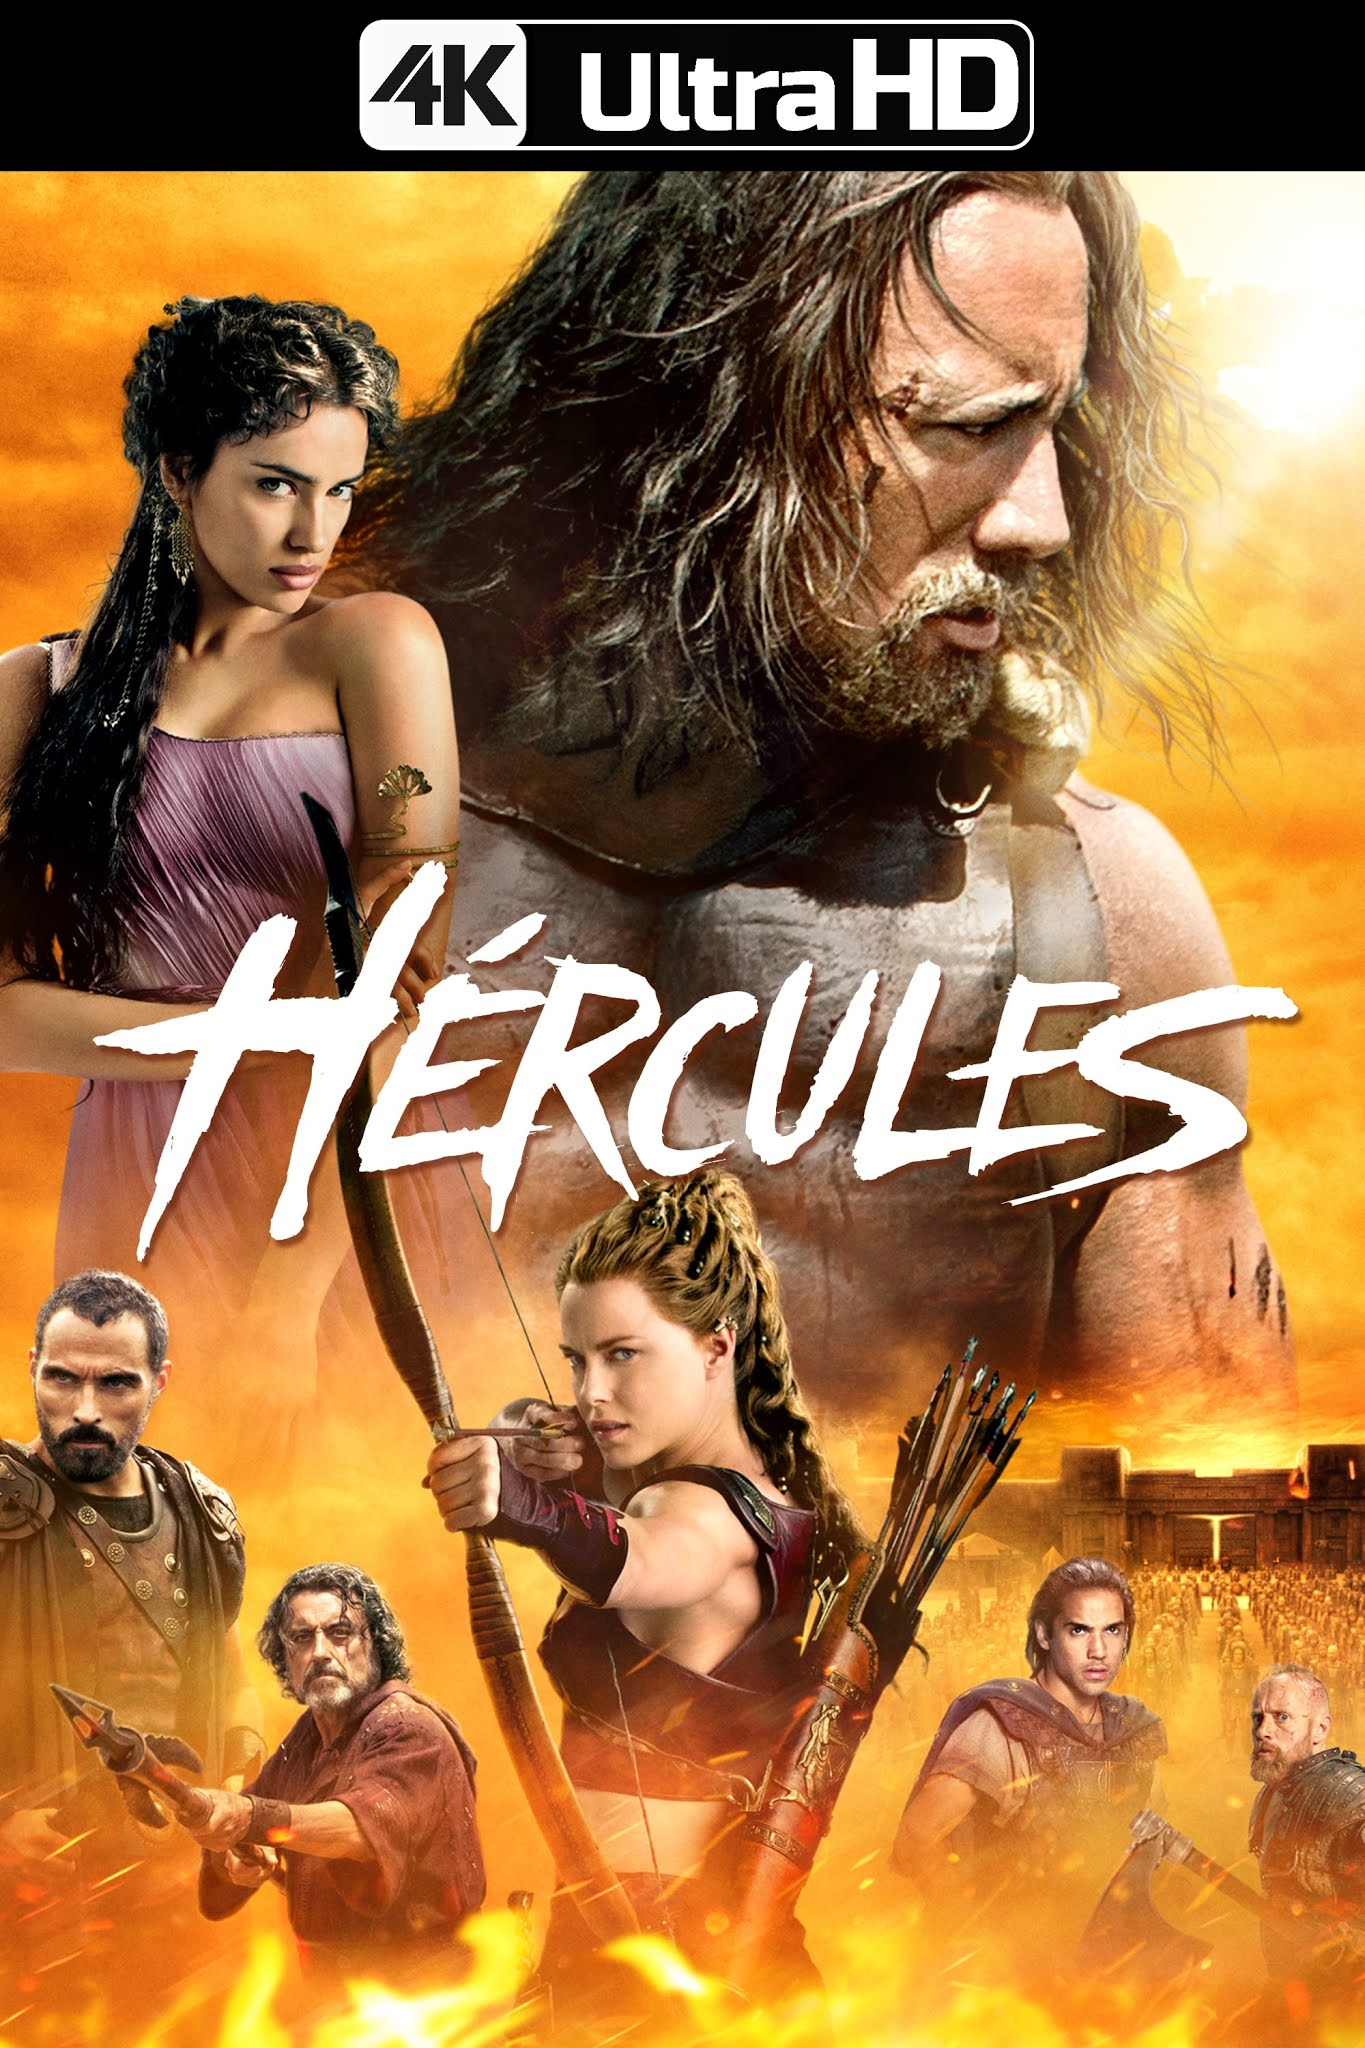 Hércules (2014) Theatrical 4K UHD SDR WEB Latino